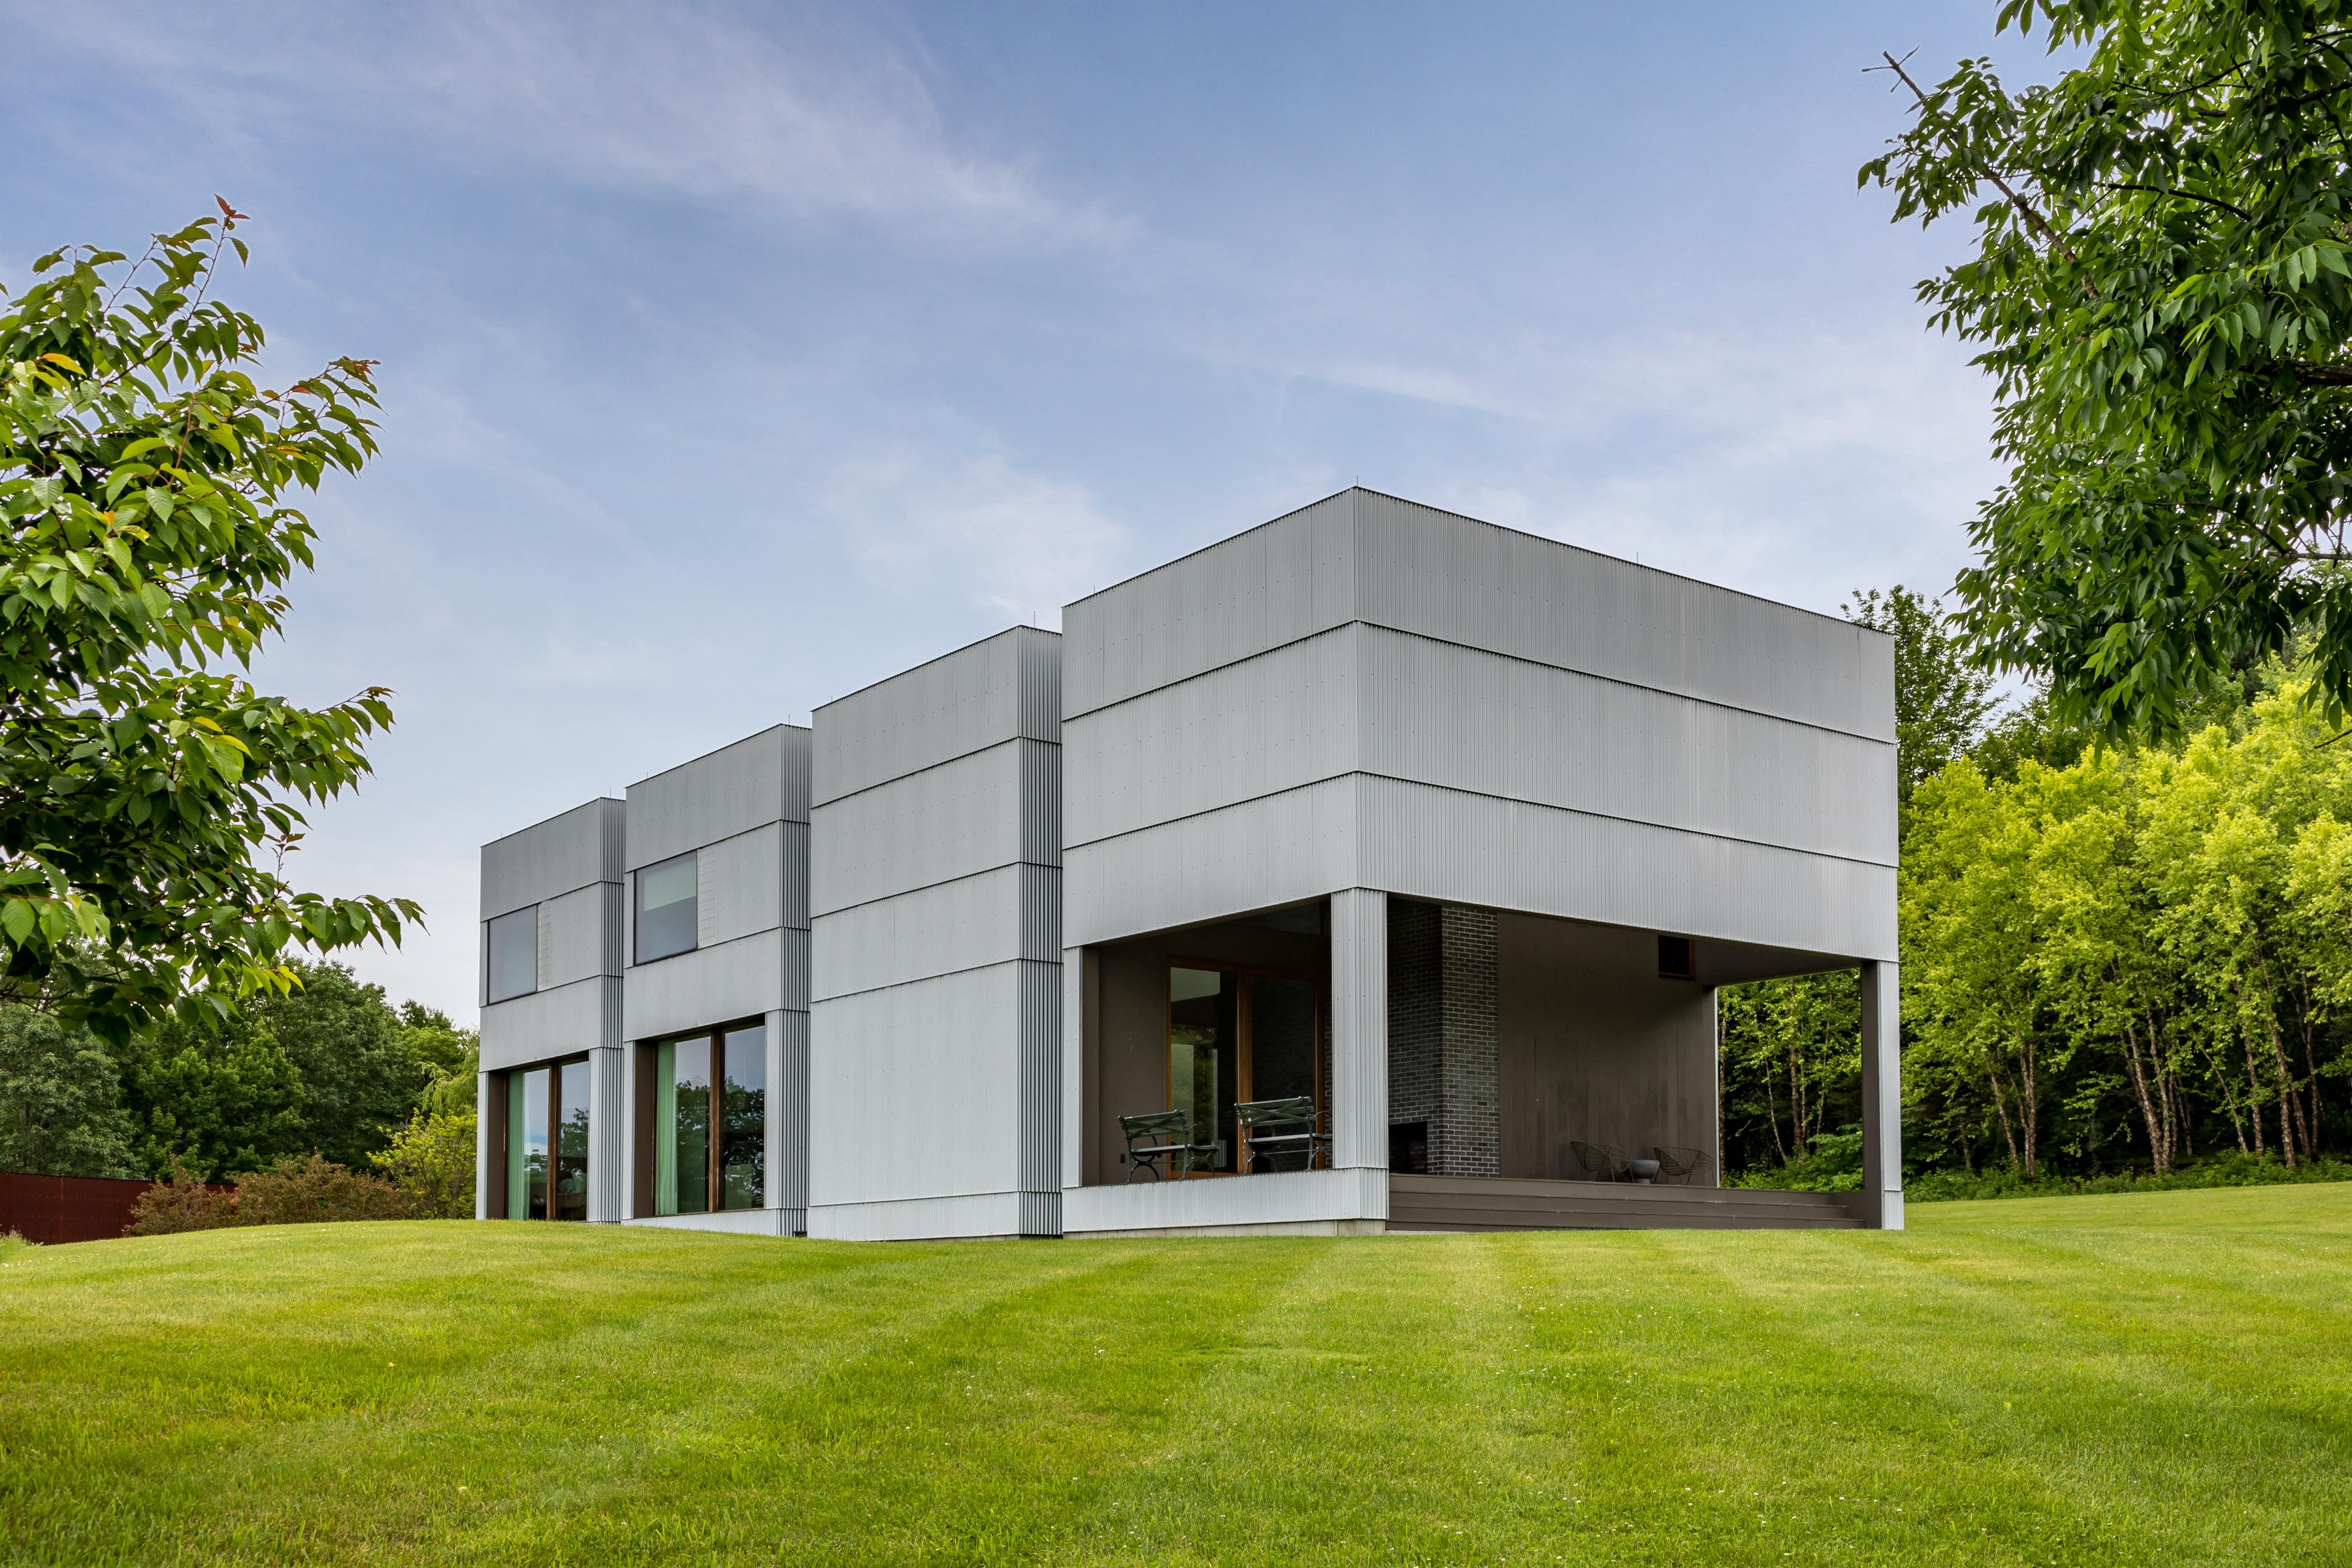 Sleek home designed by Ai Weiwei asks $5.2M